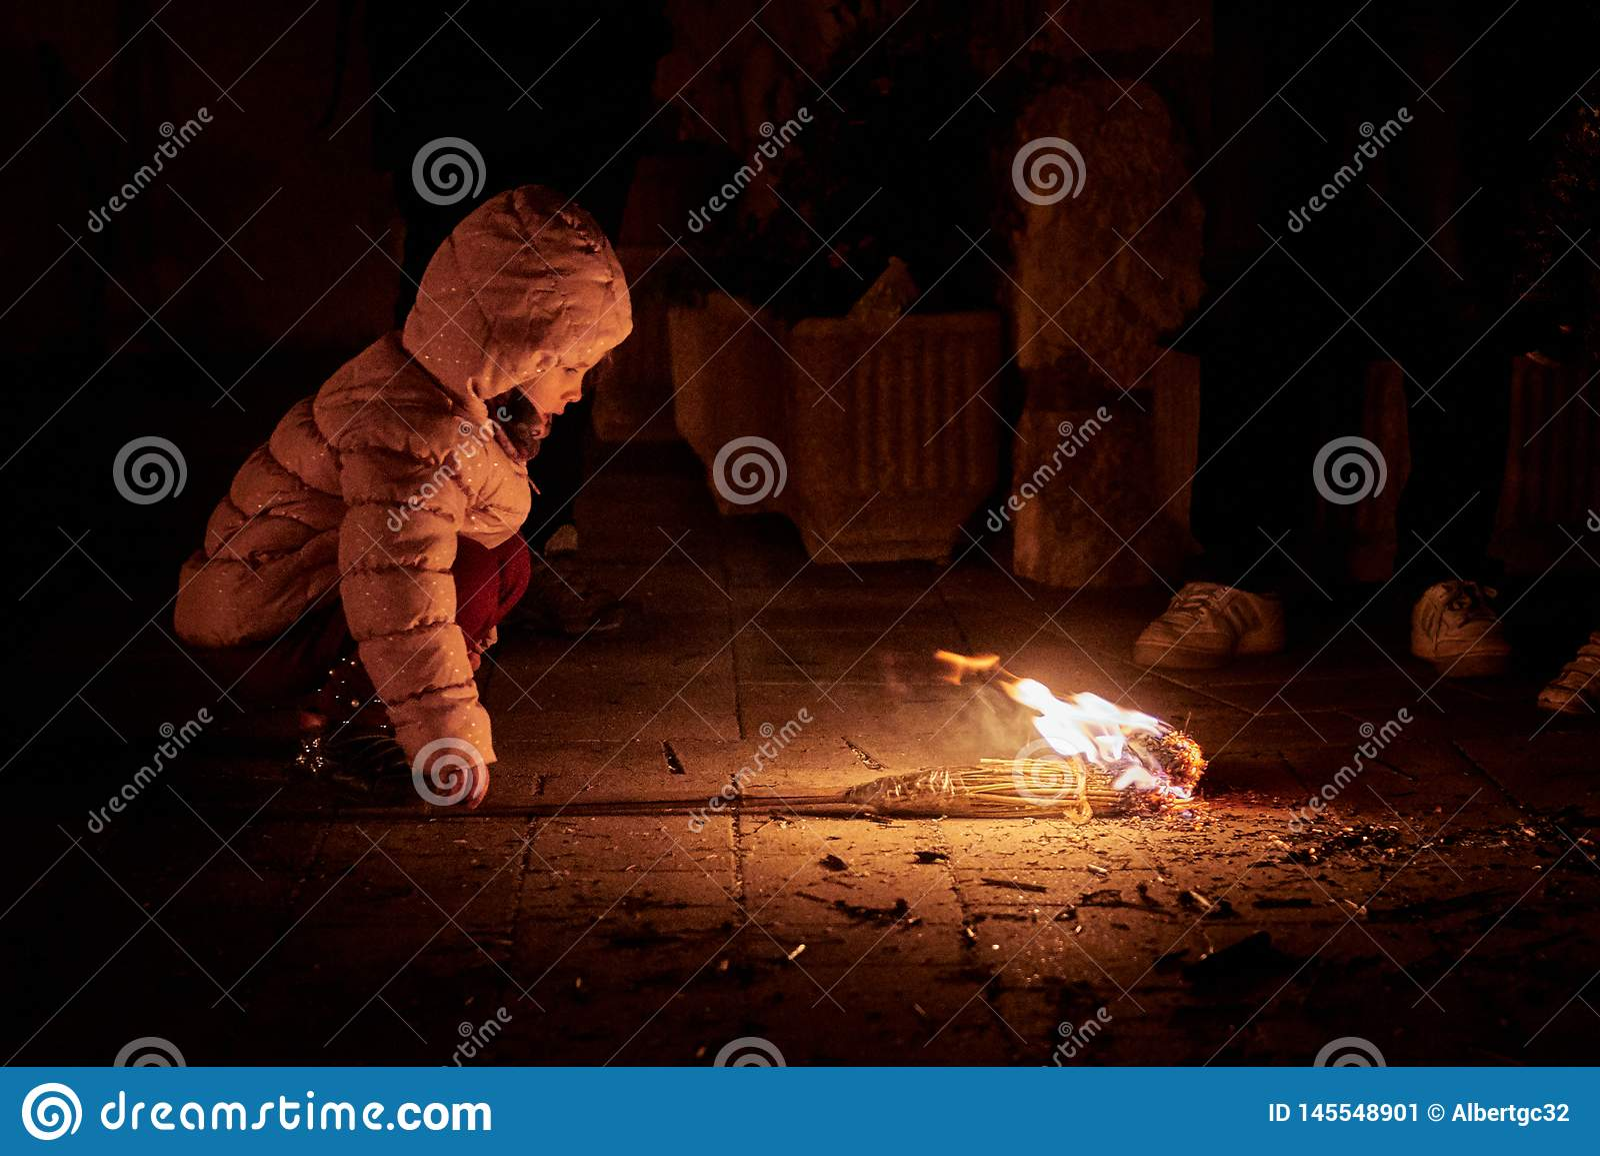 Sant Julià de Cerdanyola, Ισπανία - 24 Δεκεμβρίου 2018: μικρό κορίτσι με τον πατέρα σας στο faia FIA